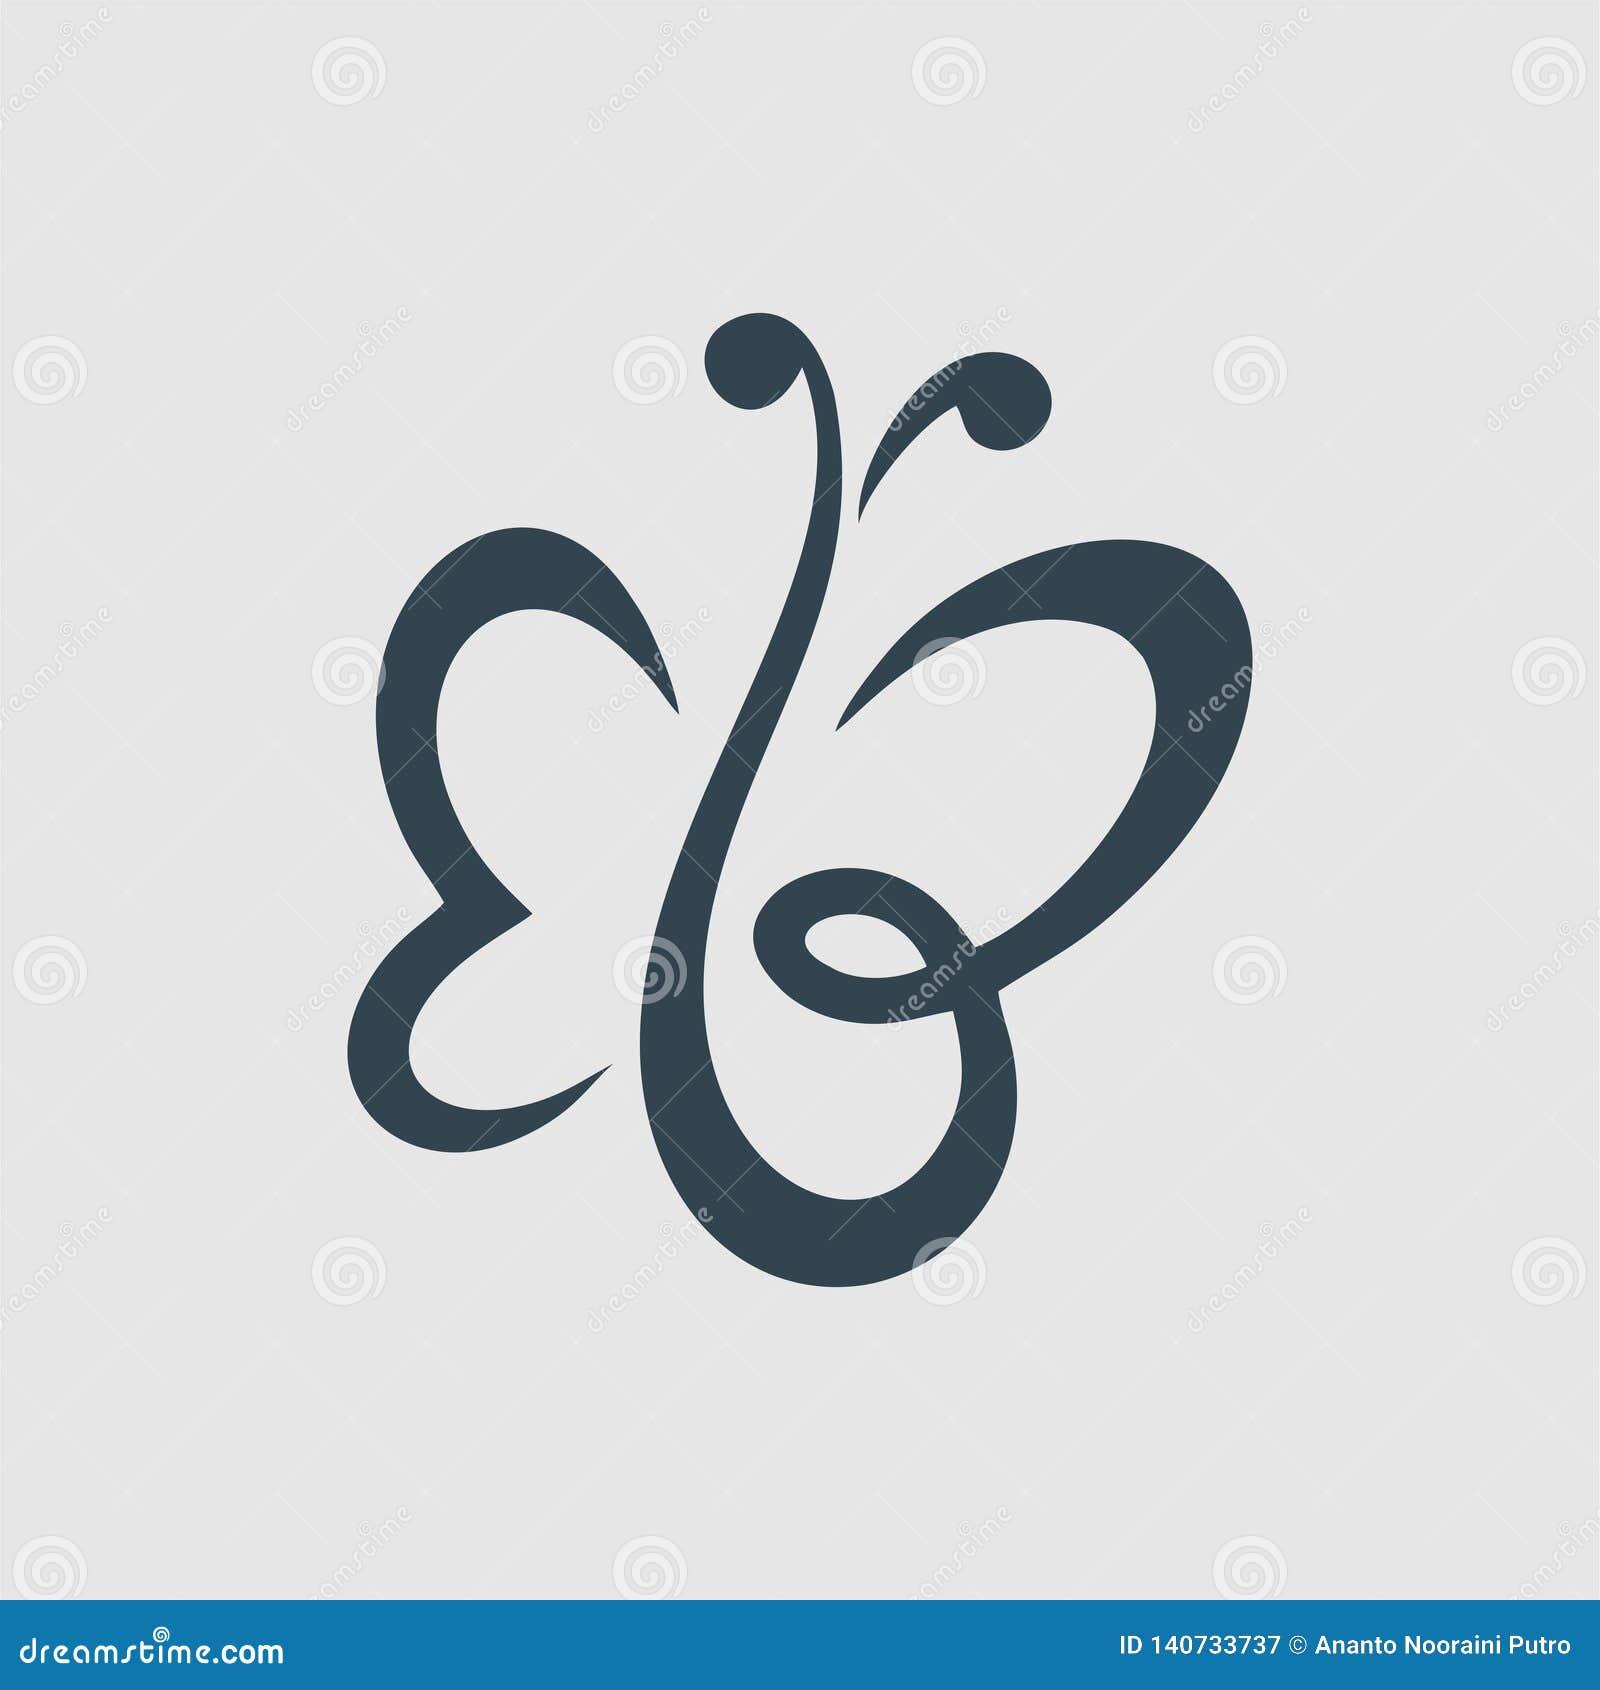 The Butterfly Or Eb Monogram Design Logo Inspiration Stock Image Illustration Of Design Logo 140733737